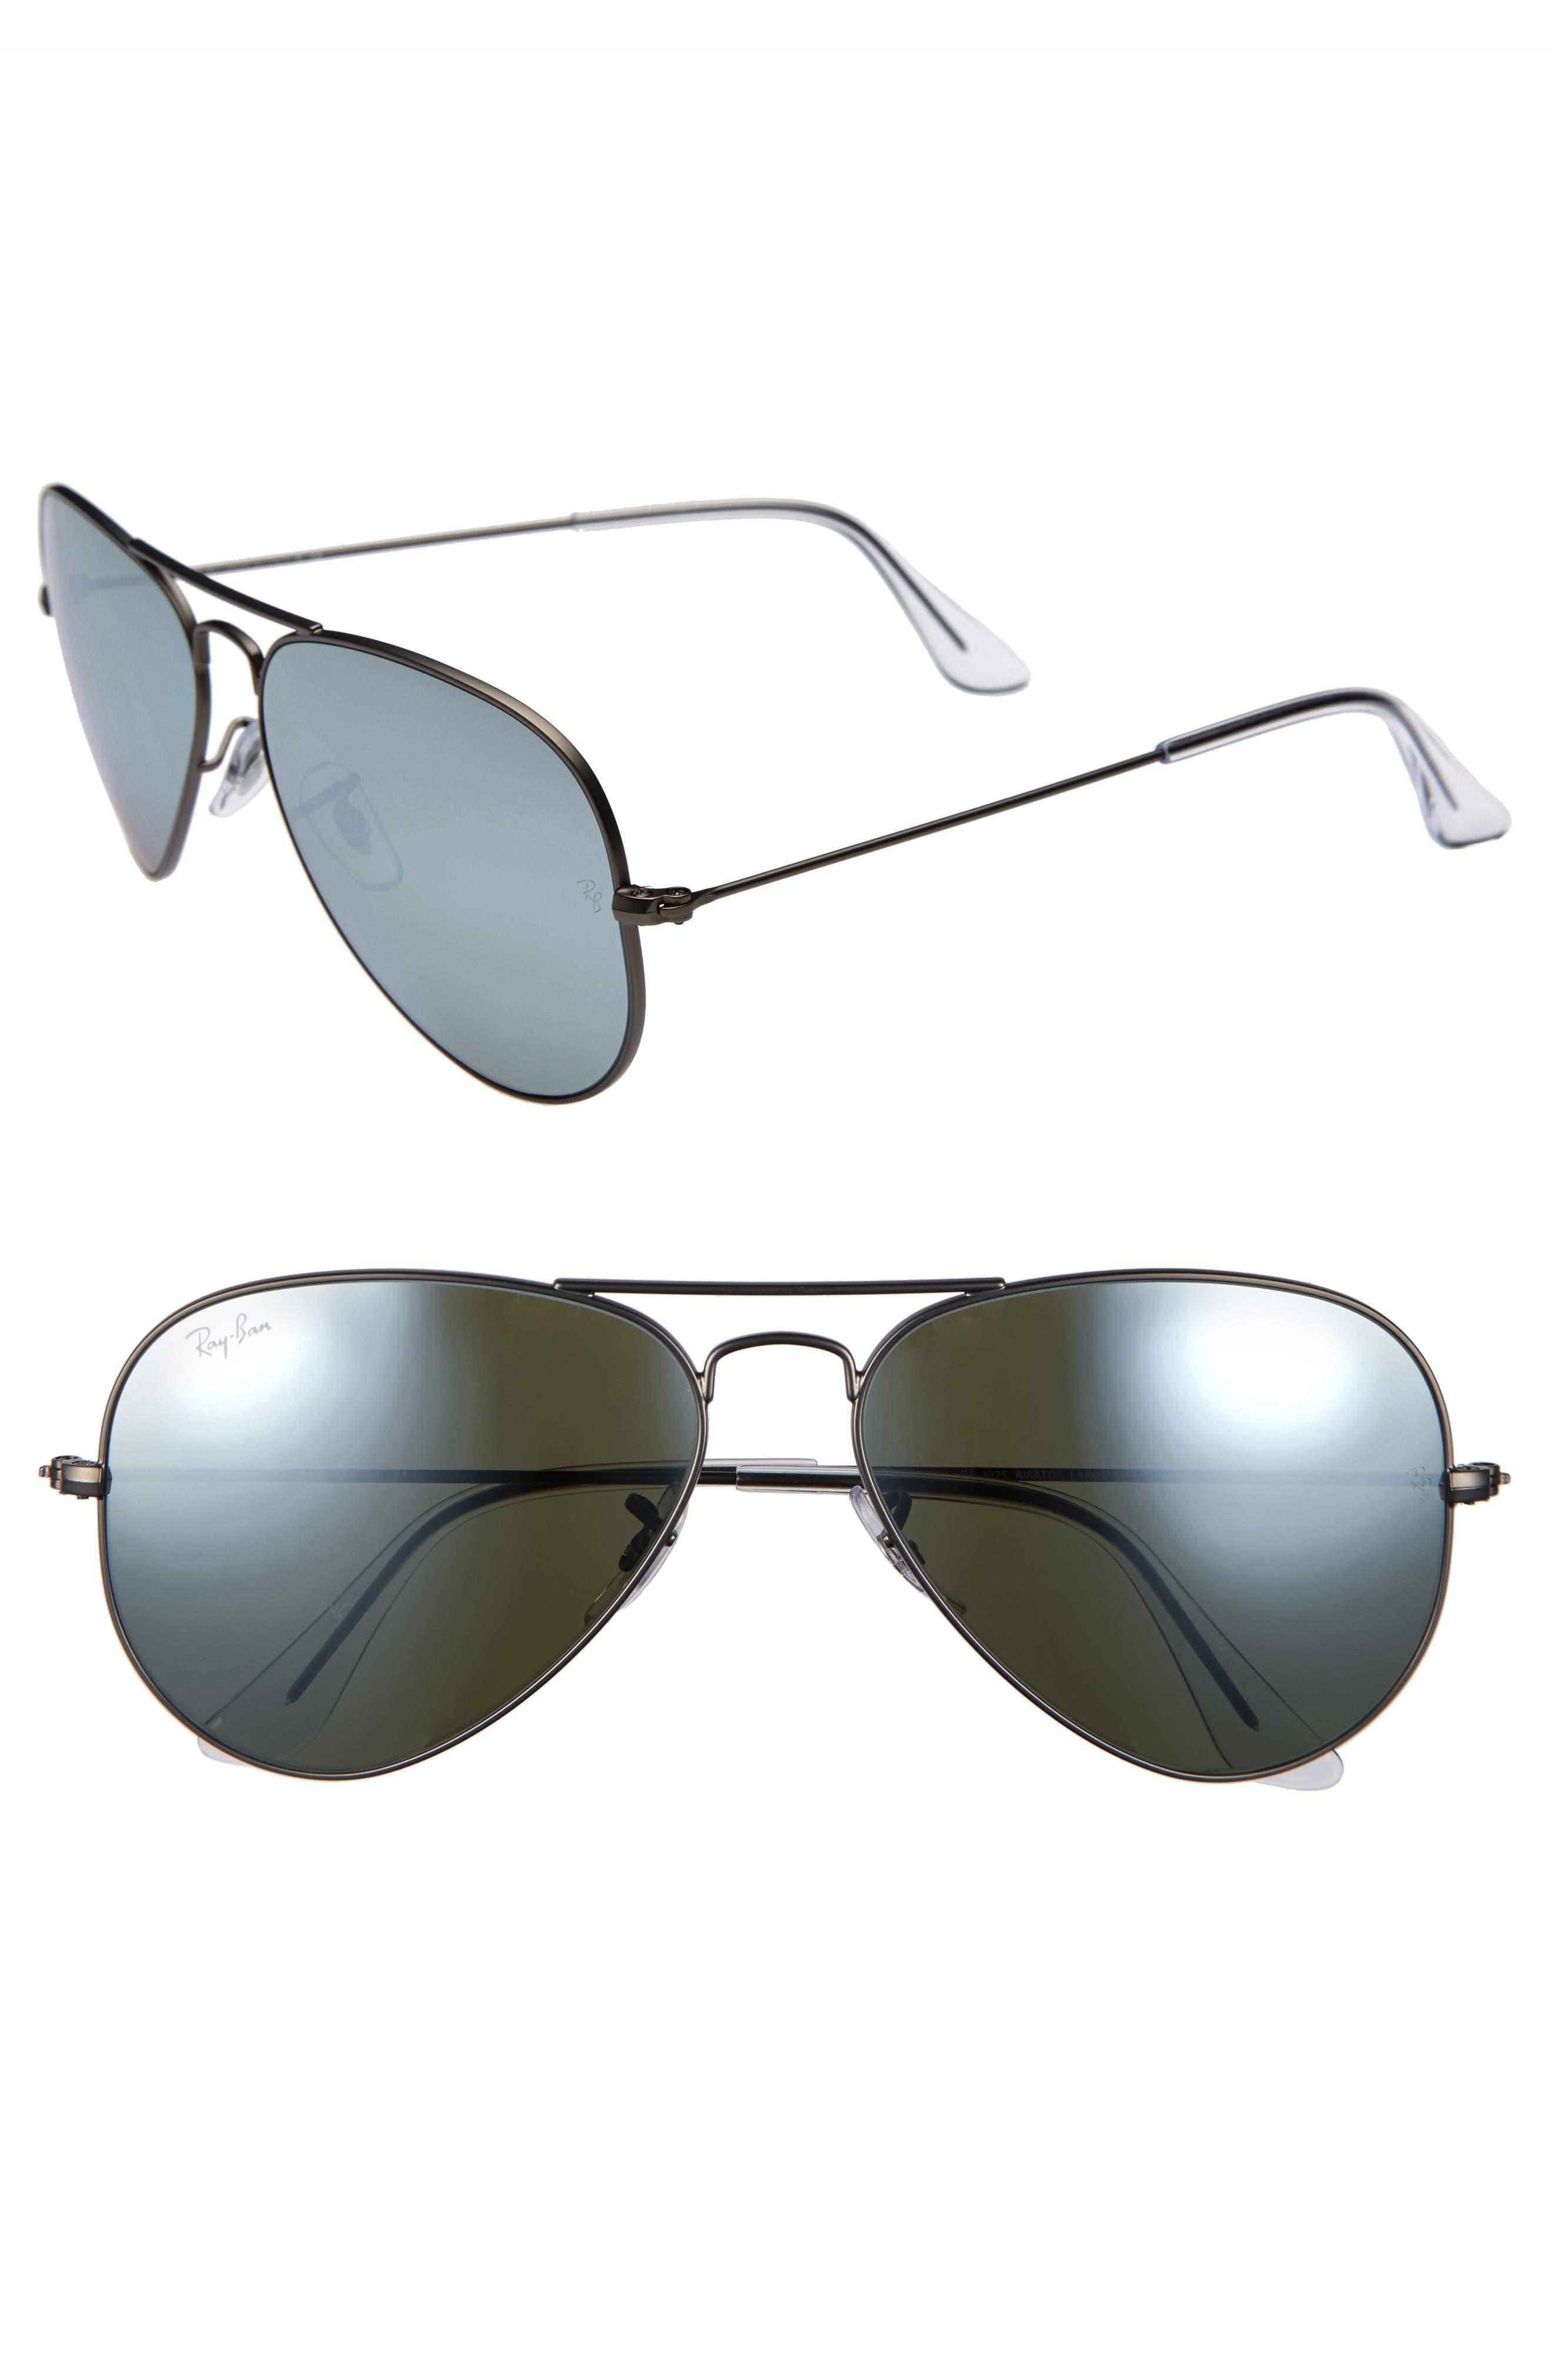 Original Aviator 58mm Sunglasses,                         Main,                         color, MATTE GUN/ SILVER GREEN MIRROR